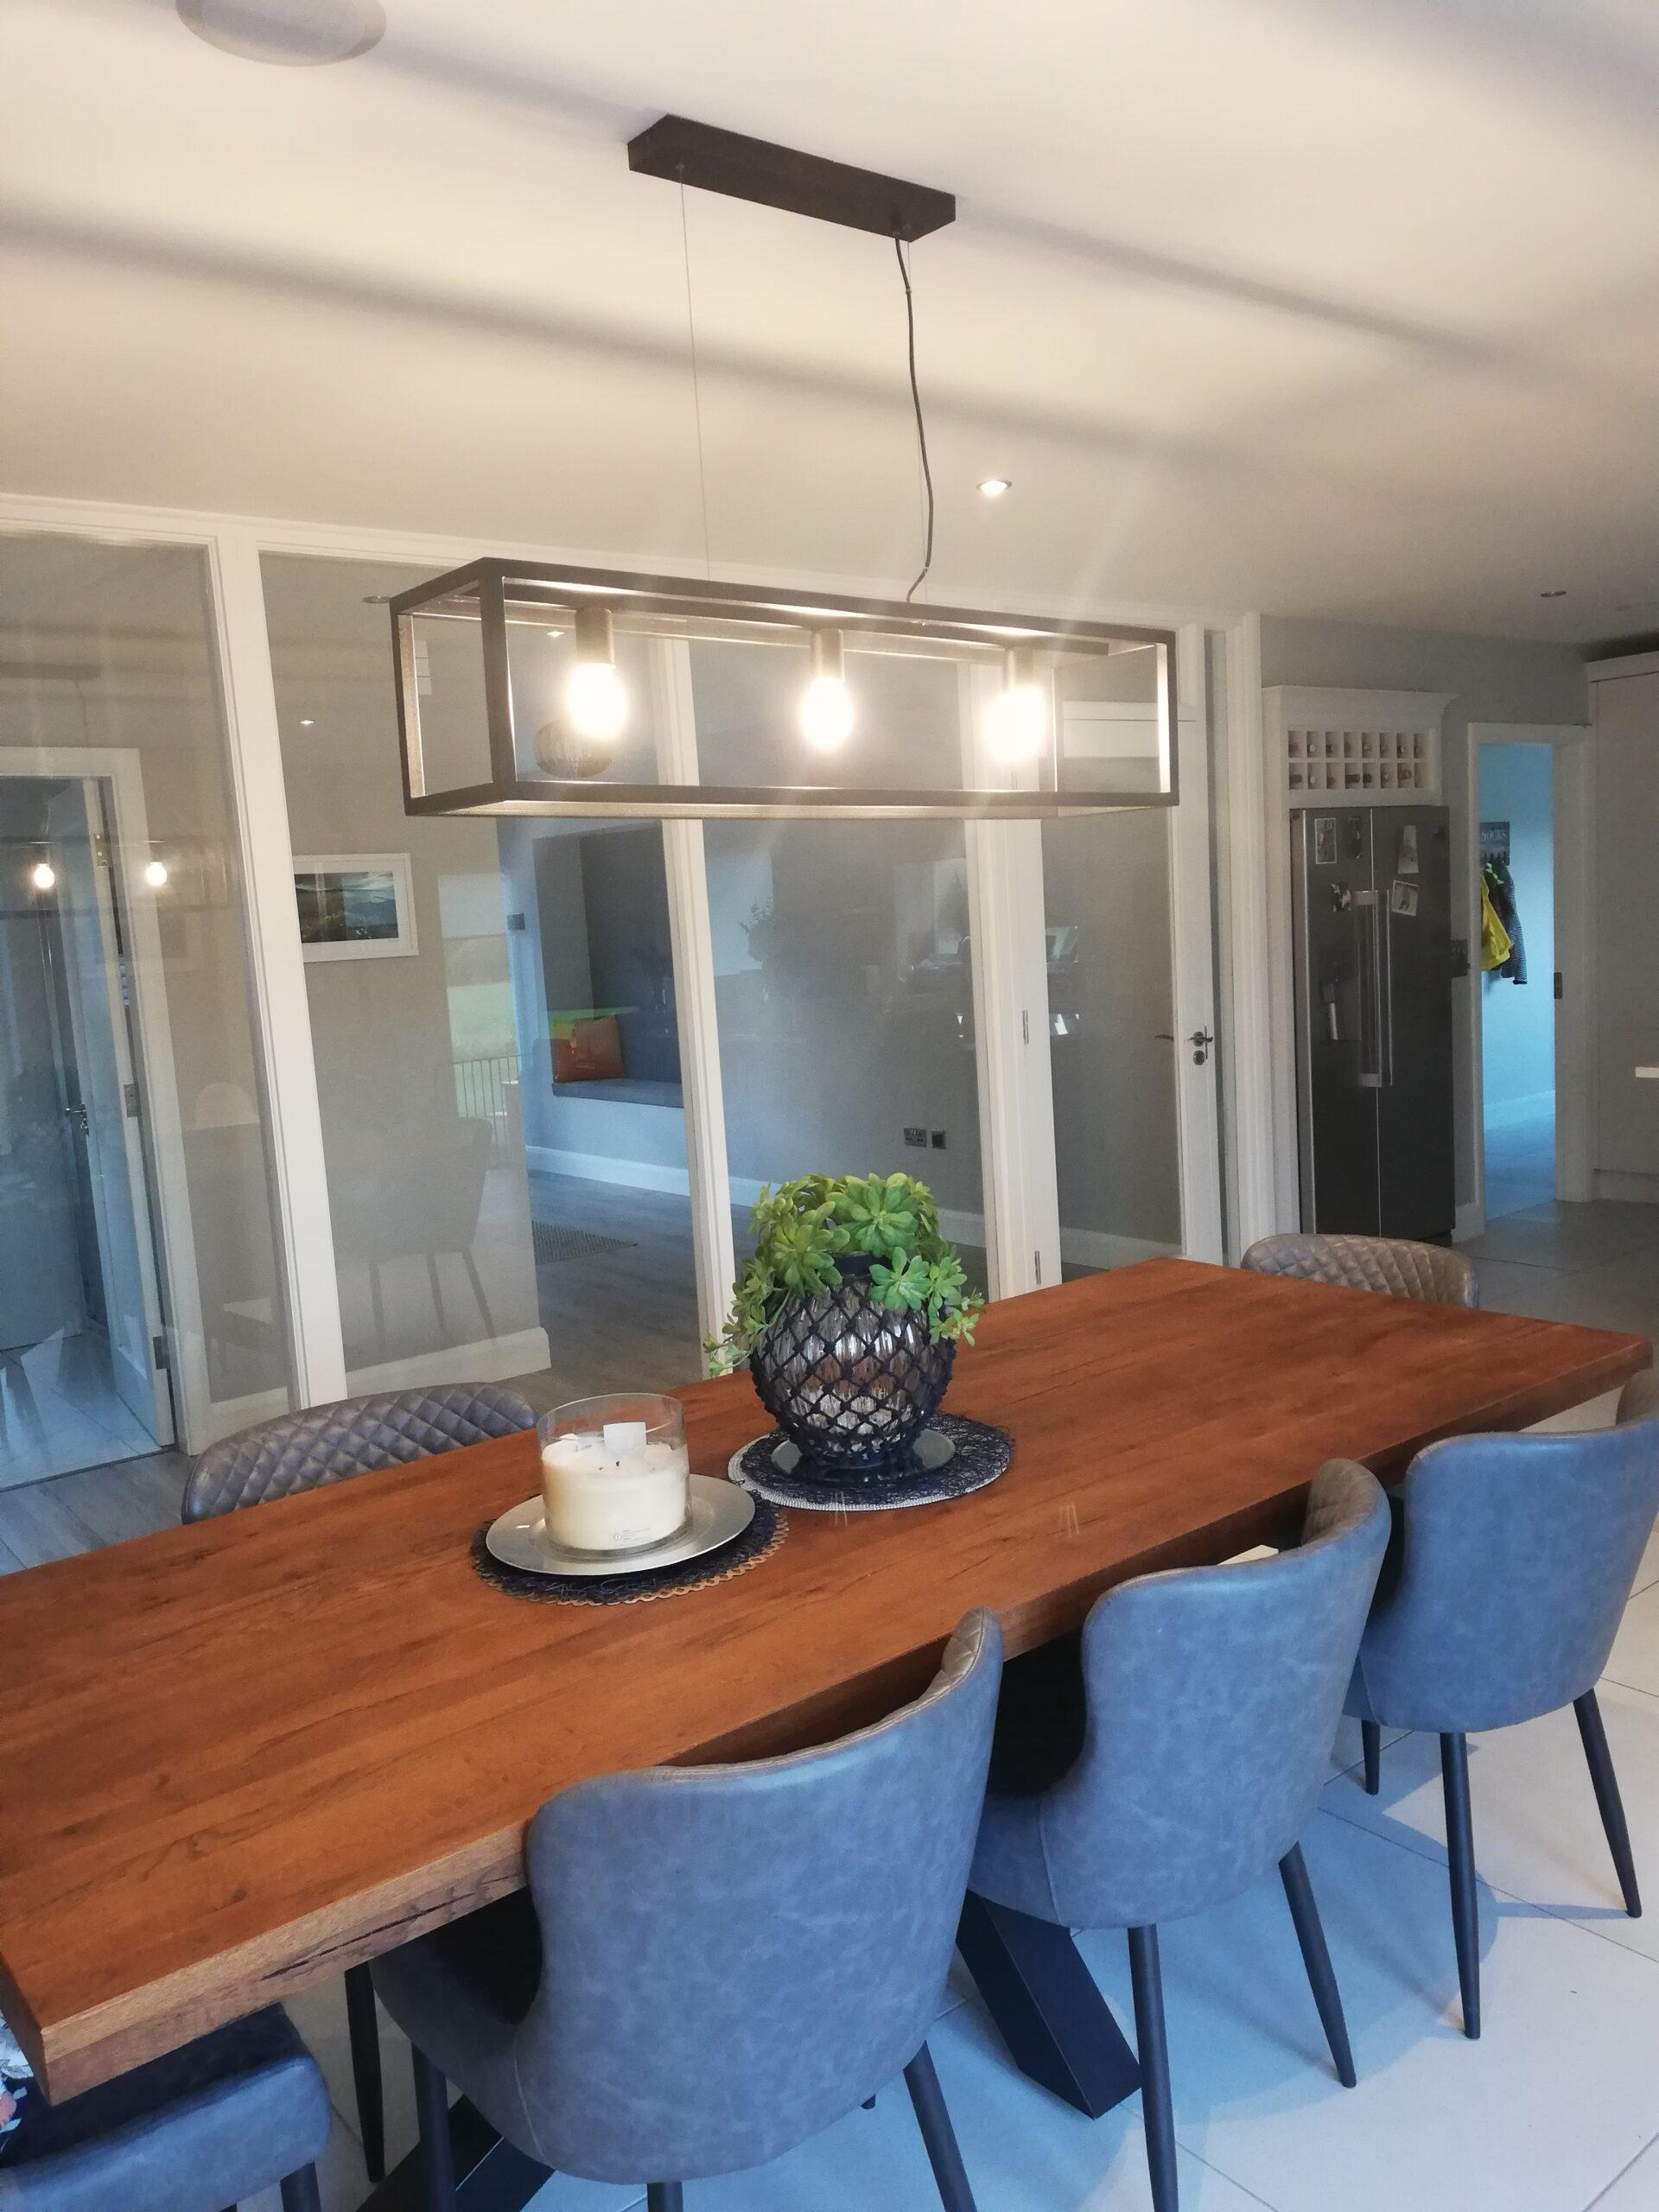 Lighting Design New Build Home